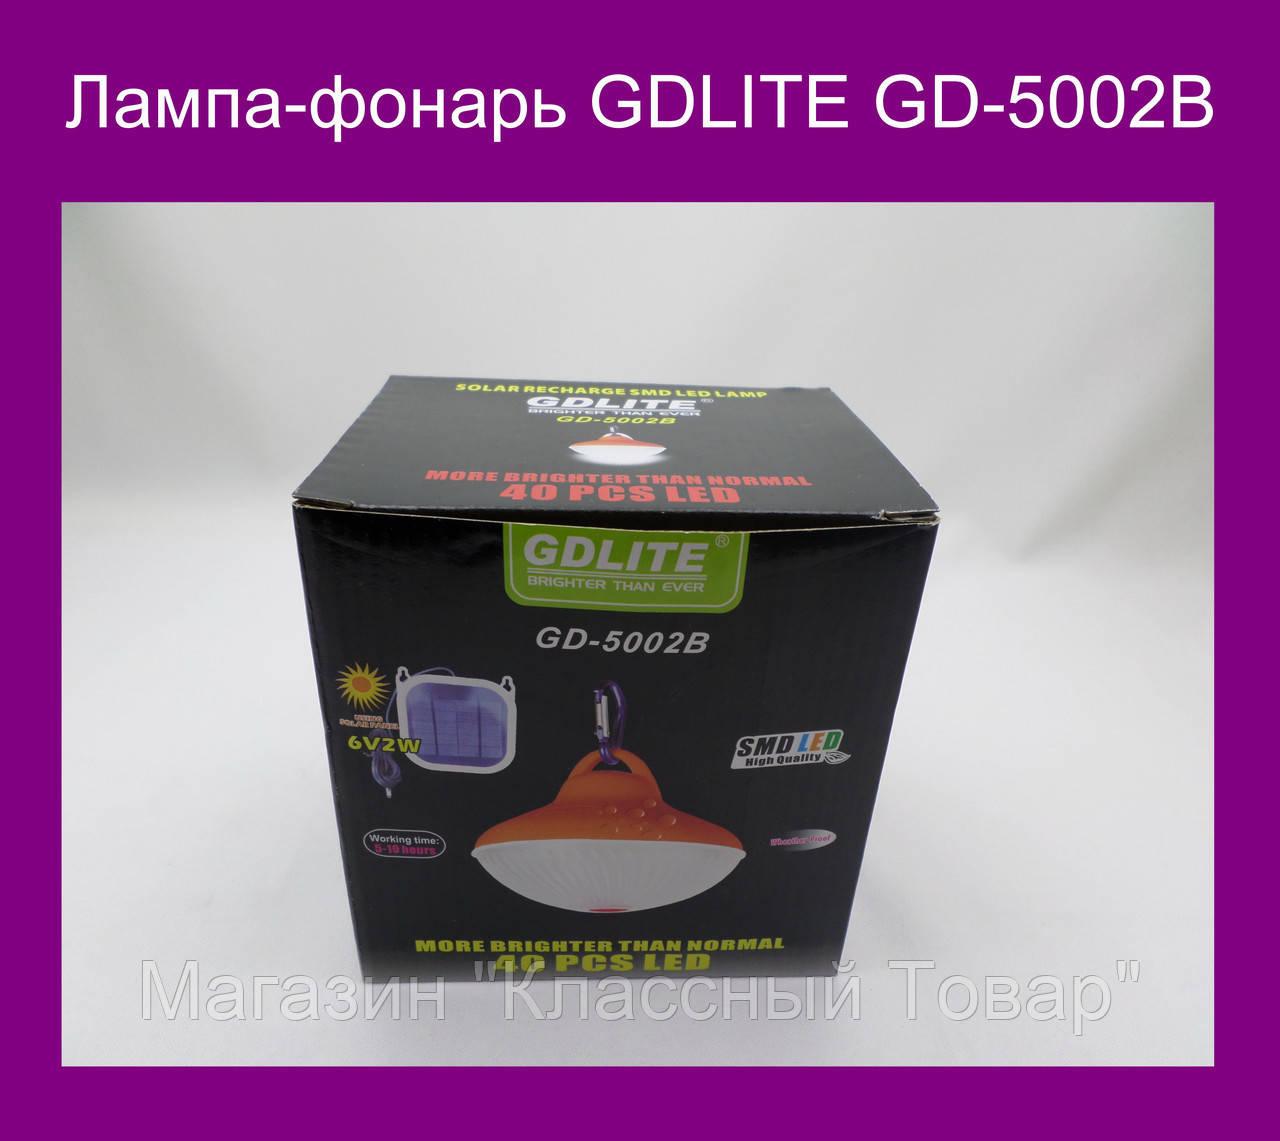 SALE! Лампа-фонарь GDLITE GD-5002B!Опт